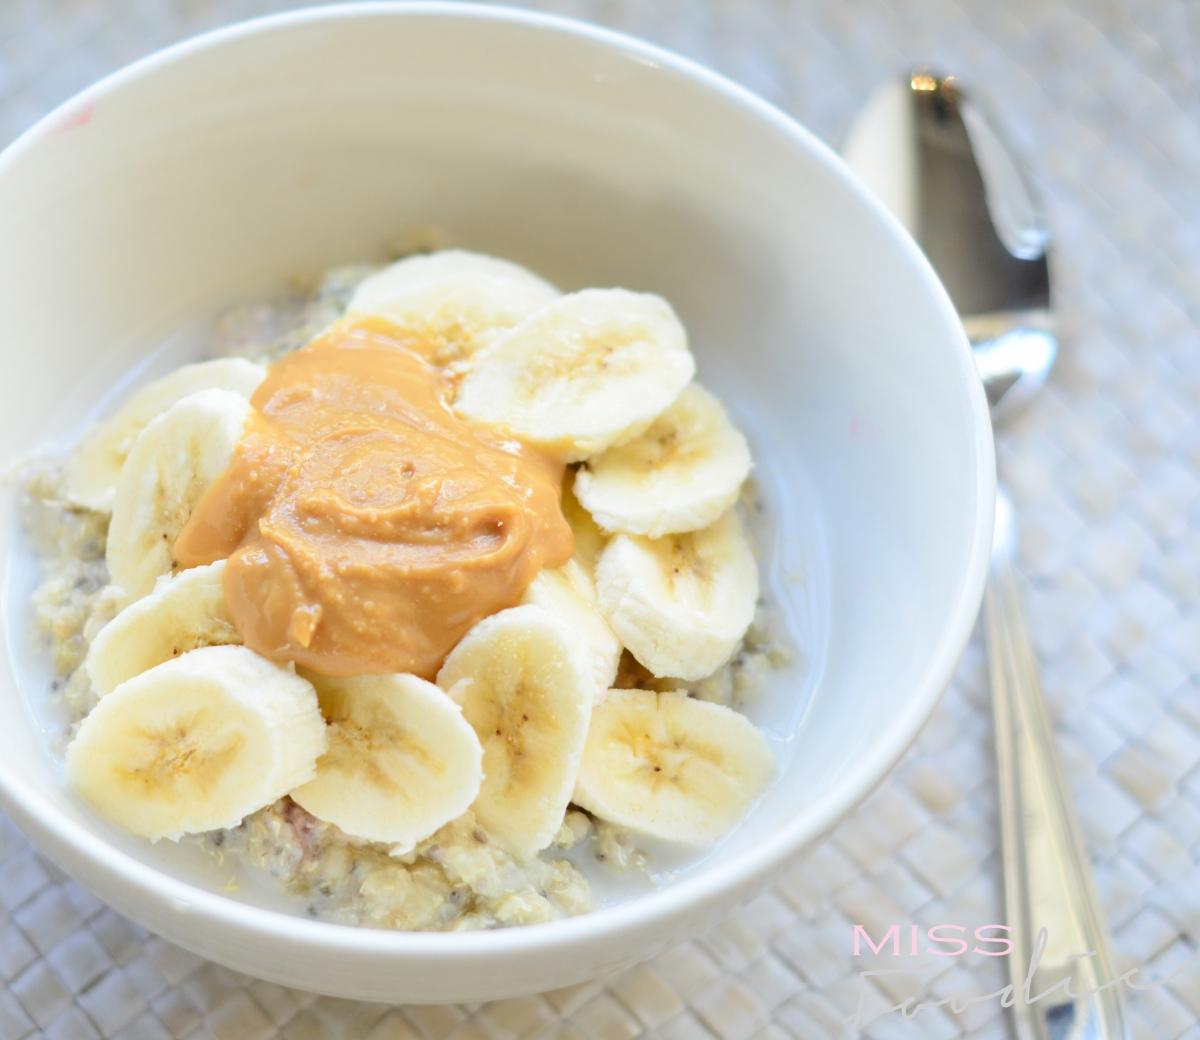 Quinoa-Chia-Porridge-Three-Ways-Miss-Foodie-3-2.jpg